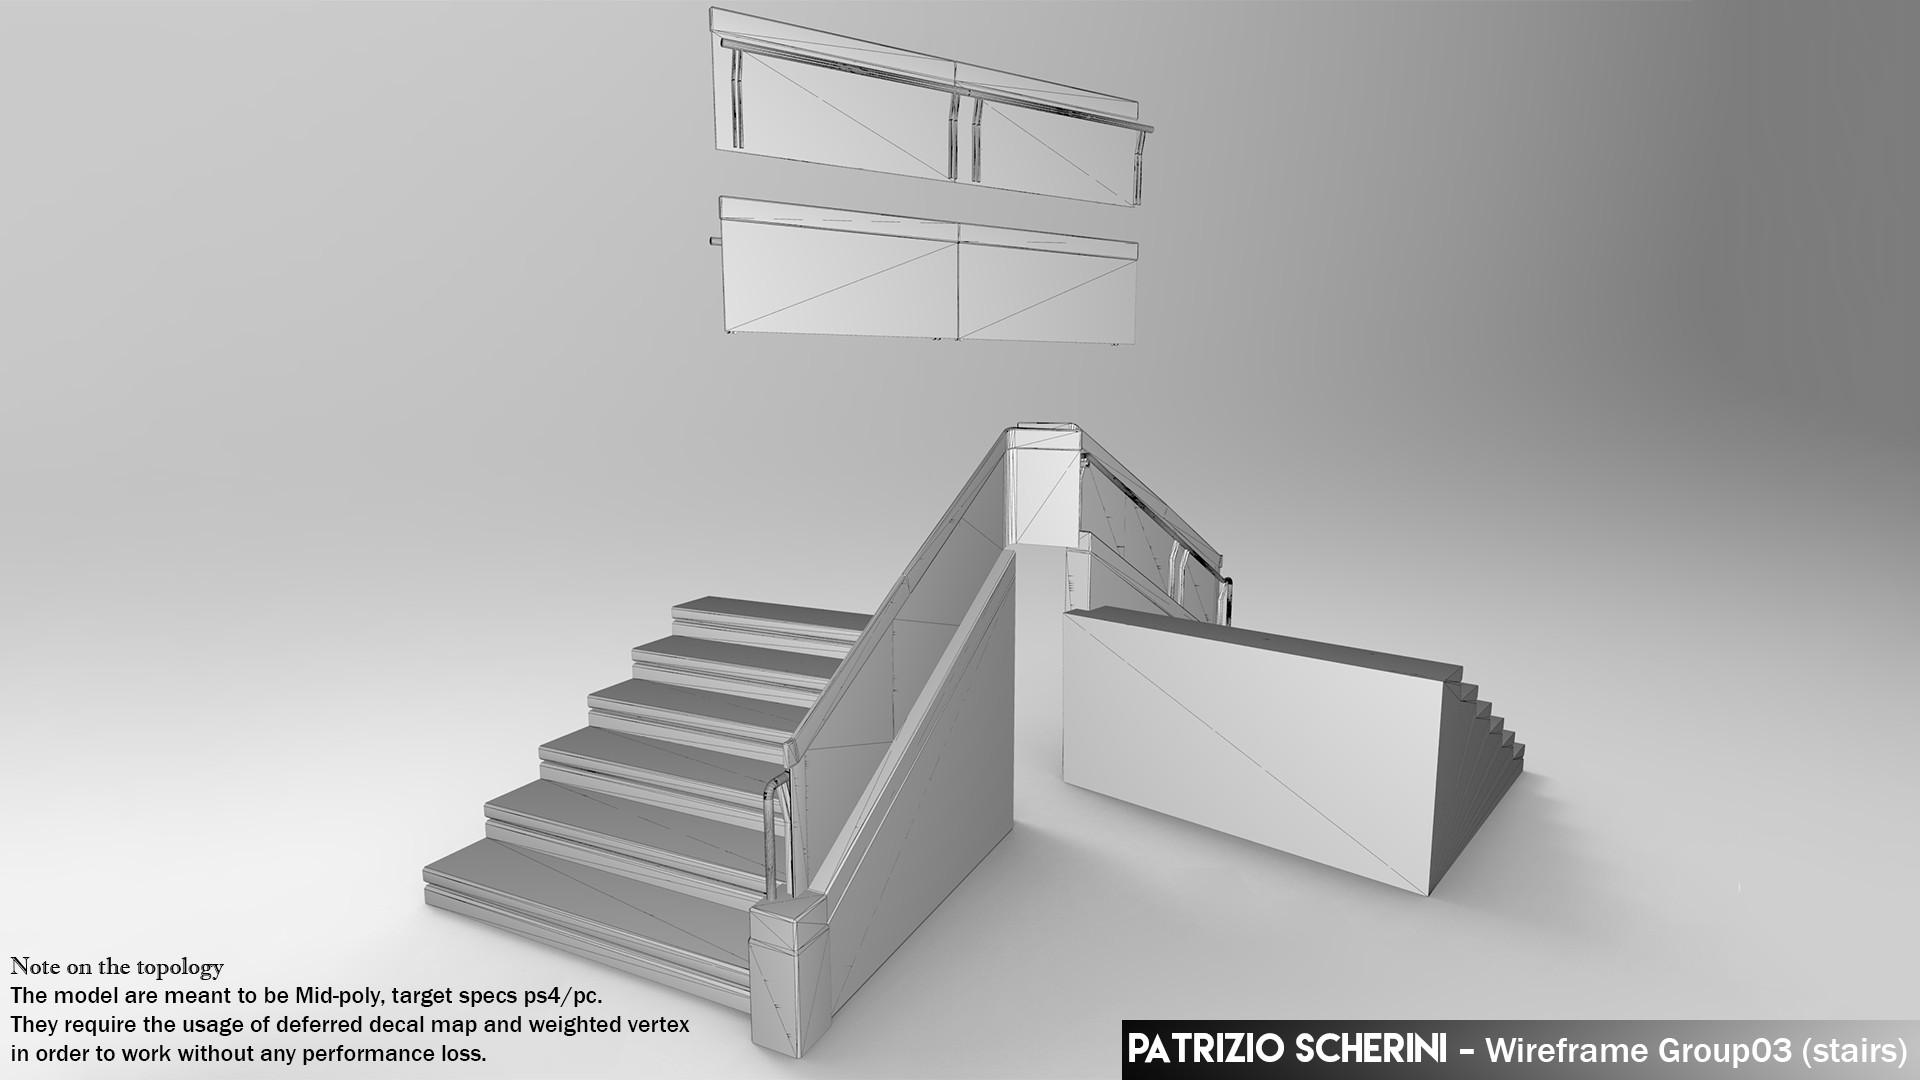 Patrizio scherini consegnapdf 0009 wireframegroup 03 stairs